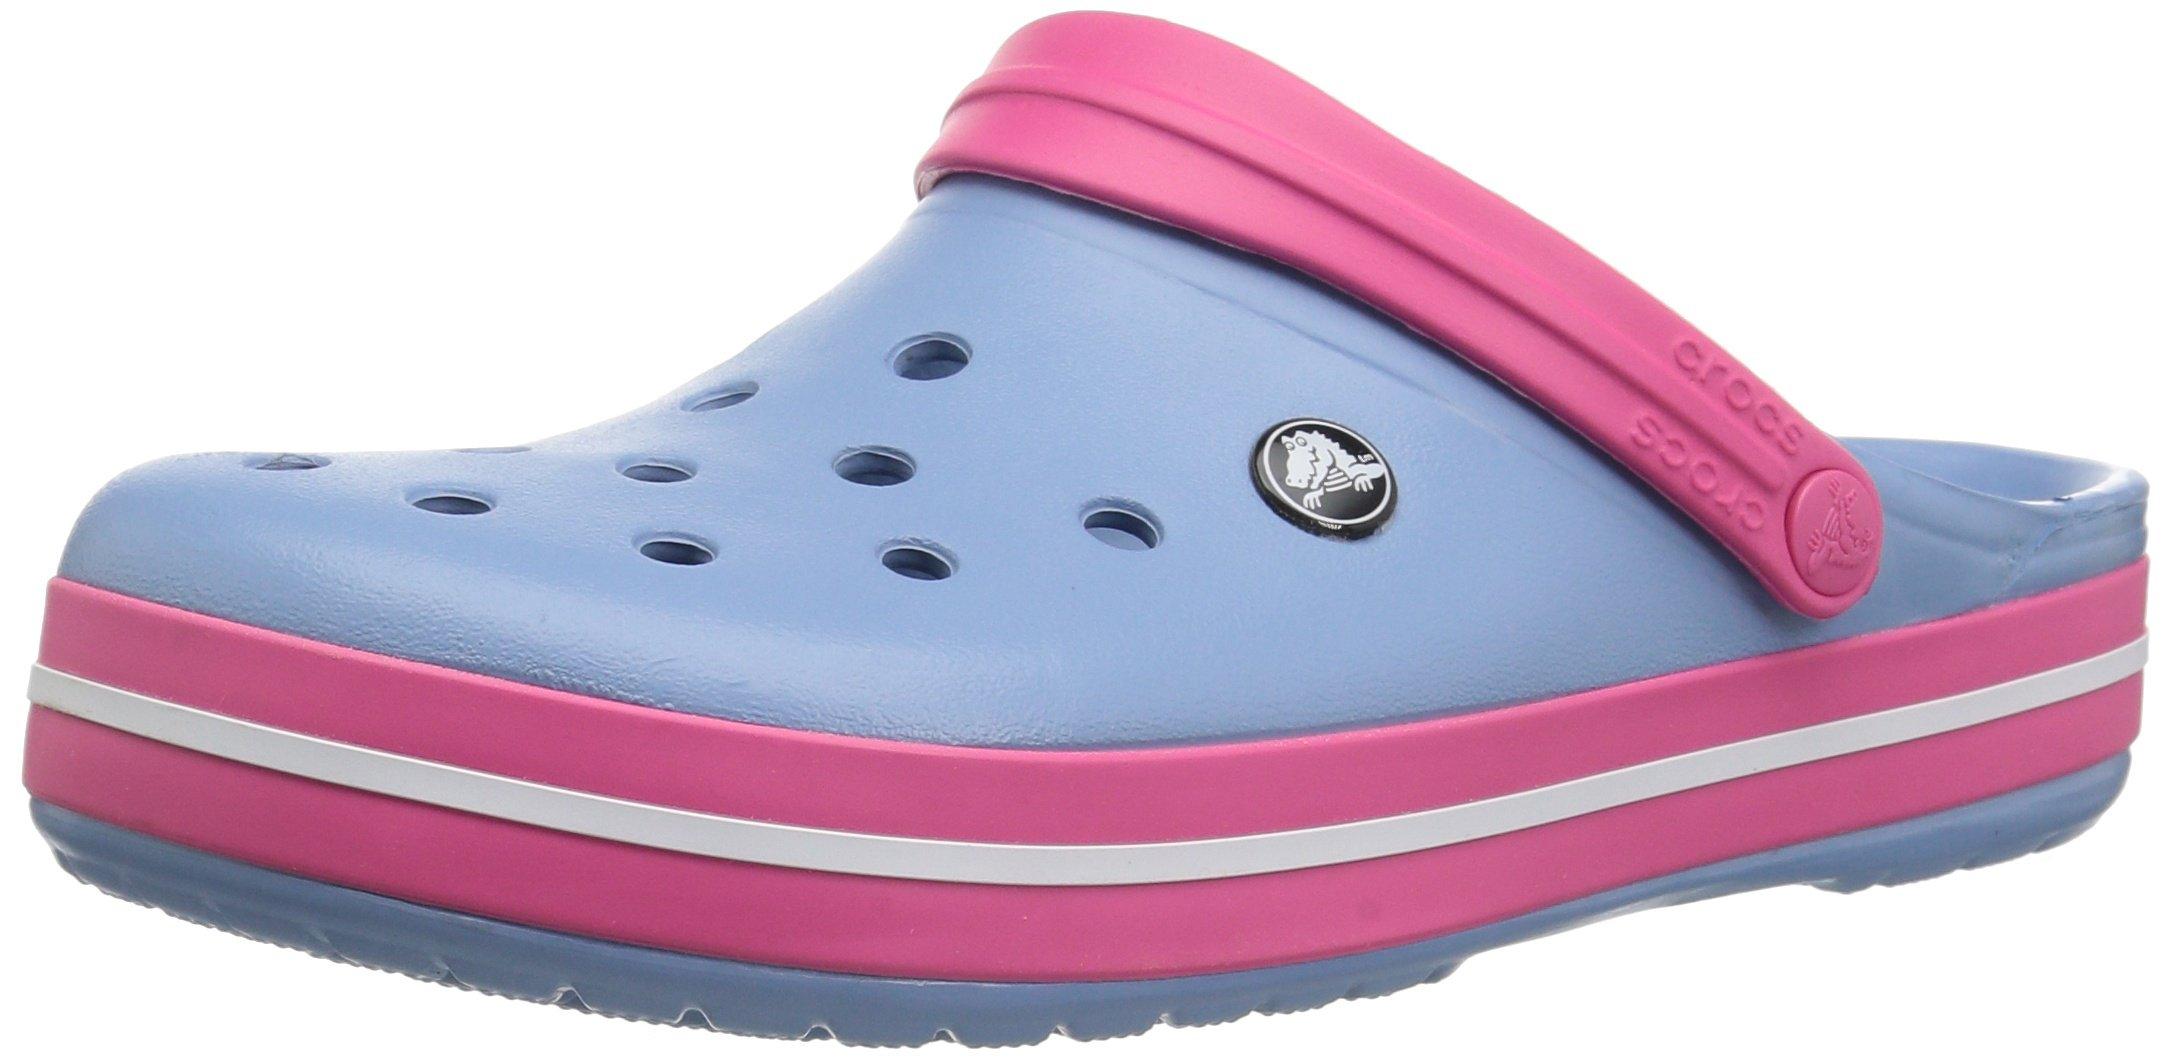 Crocs Unisex-Adult Crocband Clog, Chambray Blue/Paradise Pink, 11 US Men/13 US Women